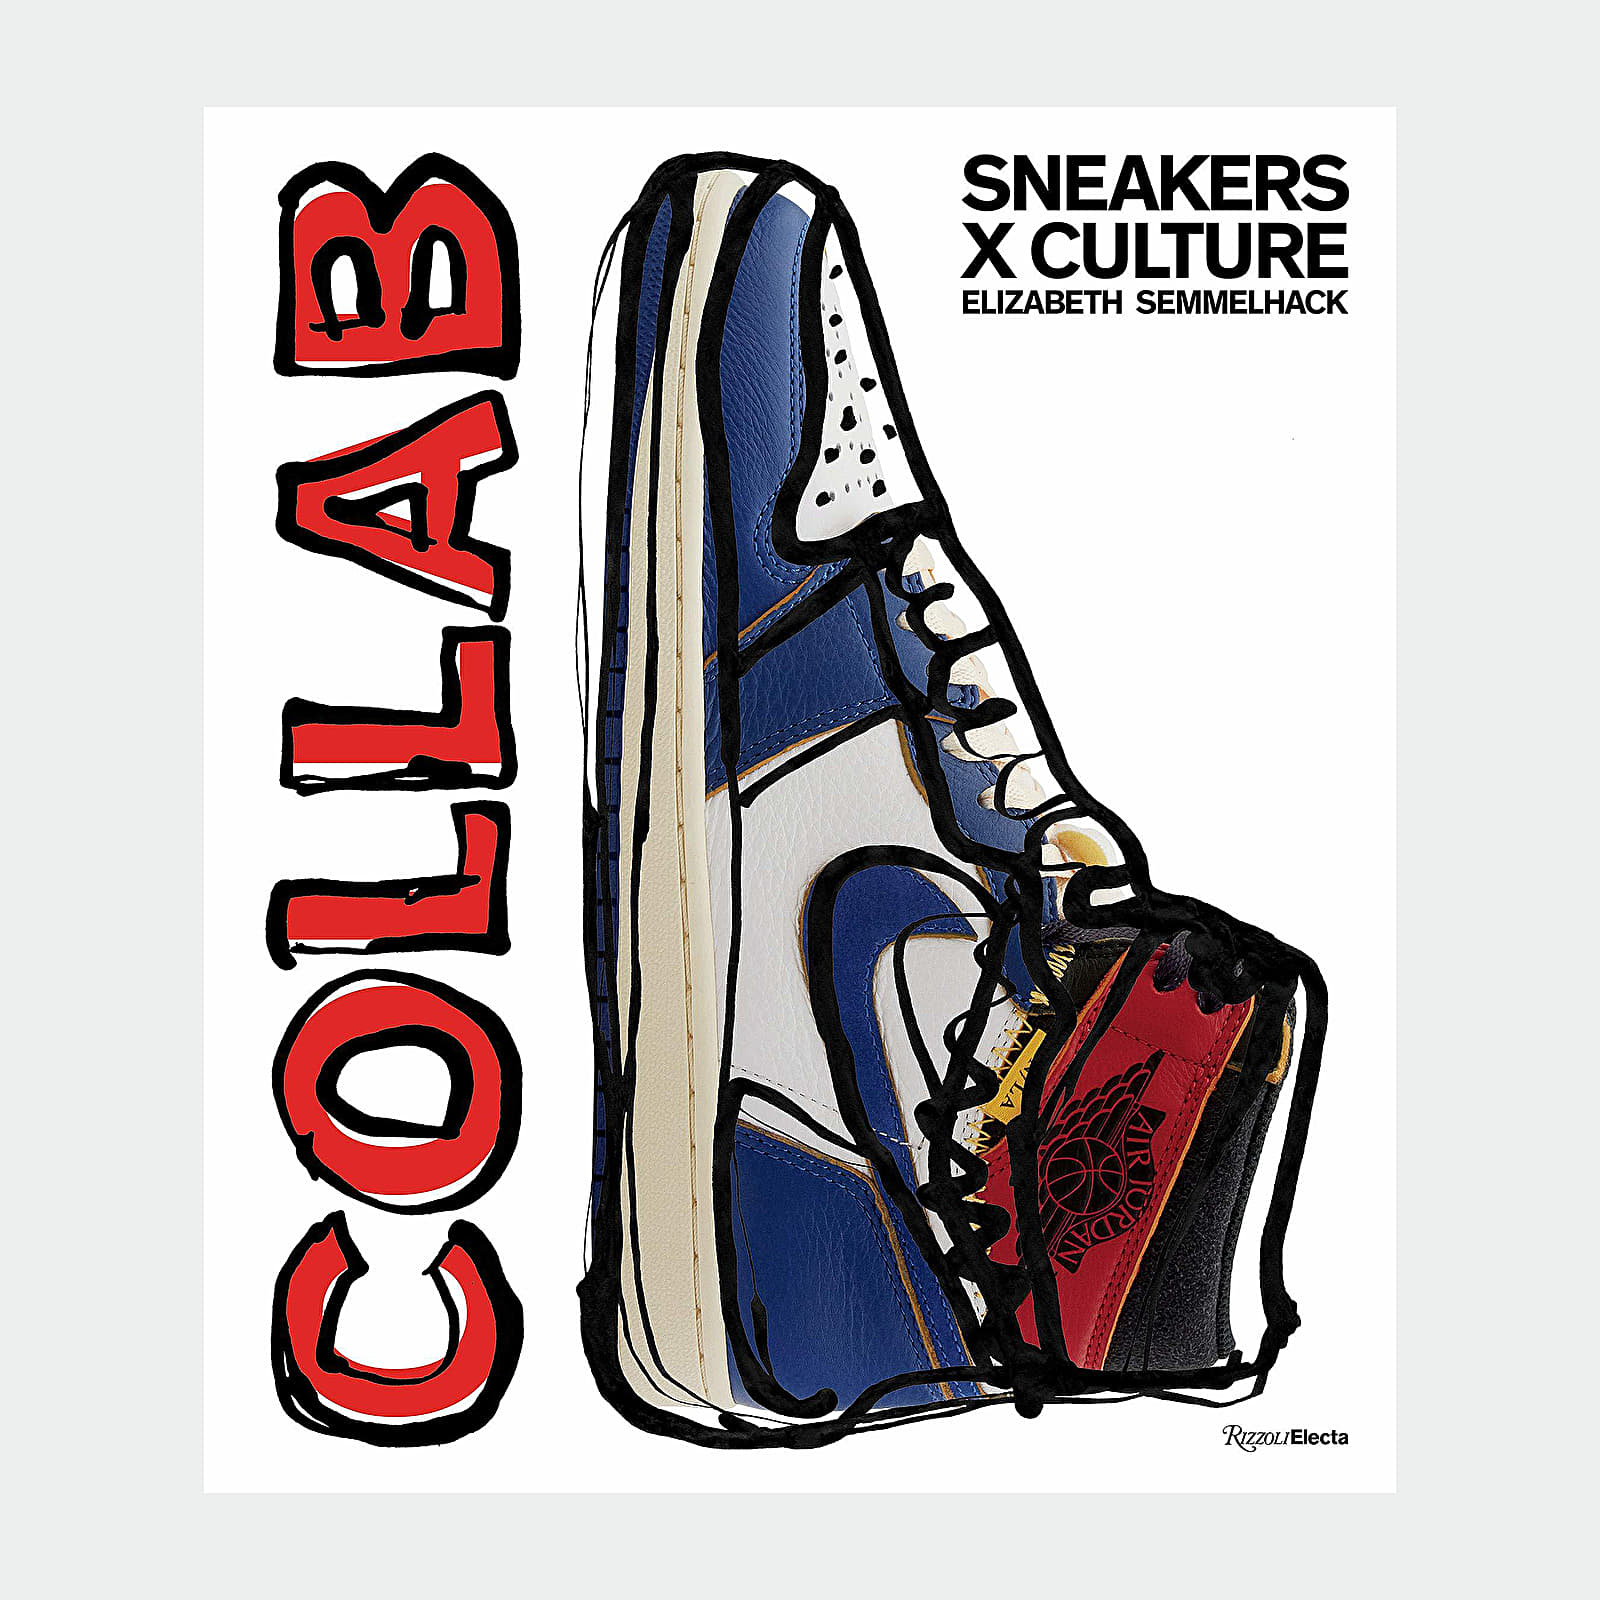 Publications Sneakers x Culture Collab By Elizabeth Semmelhack